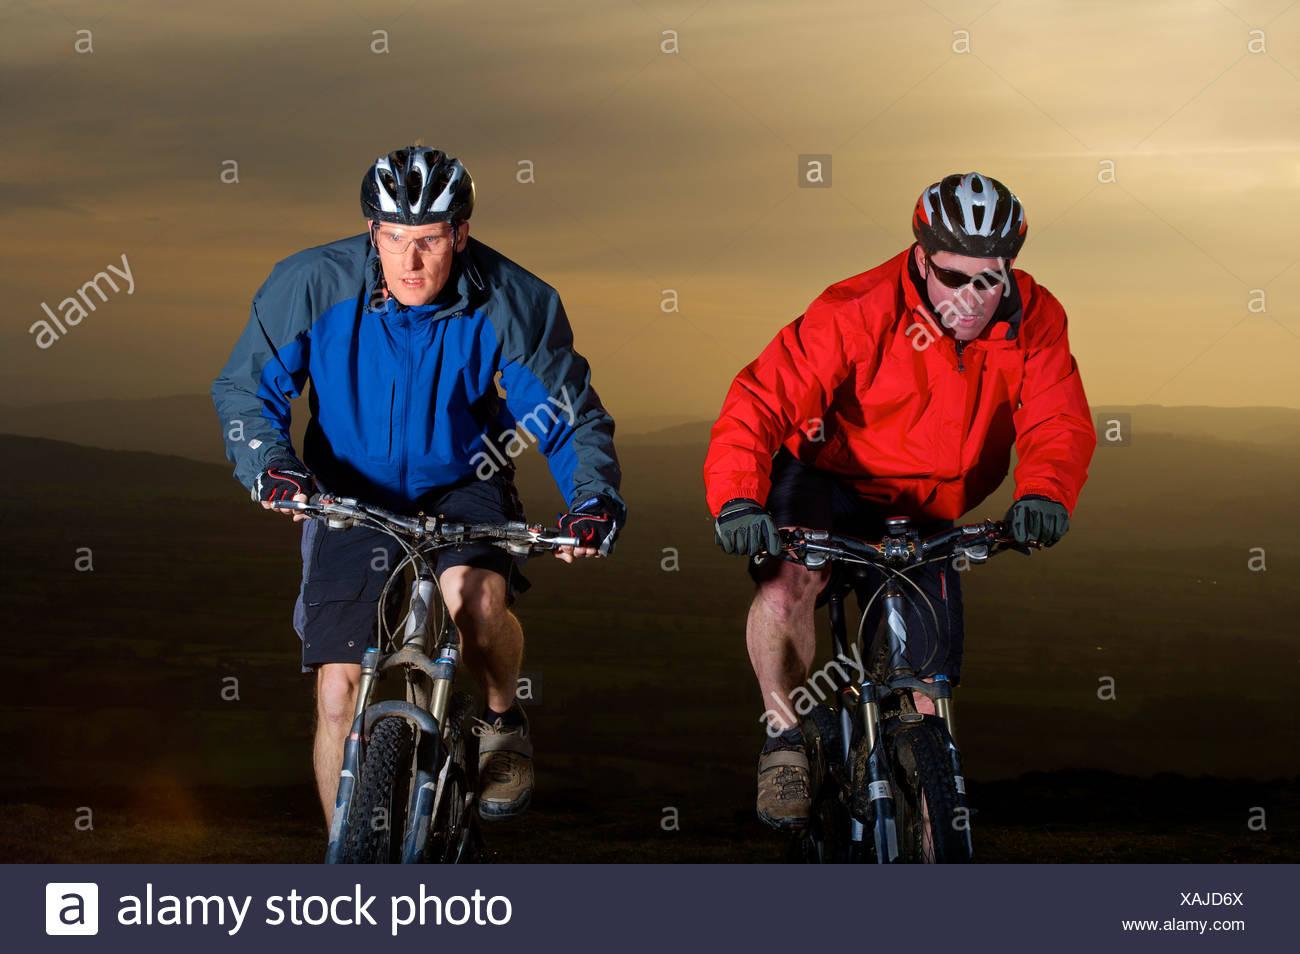 Dos ciclistas de montaña equitación juntos. Foto de stock